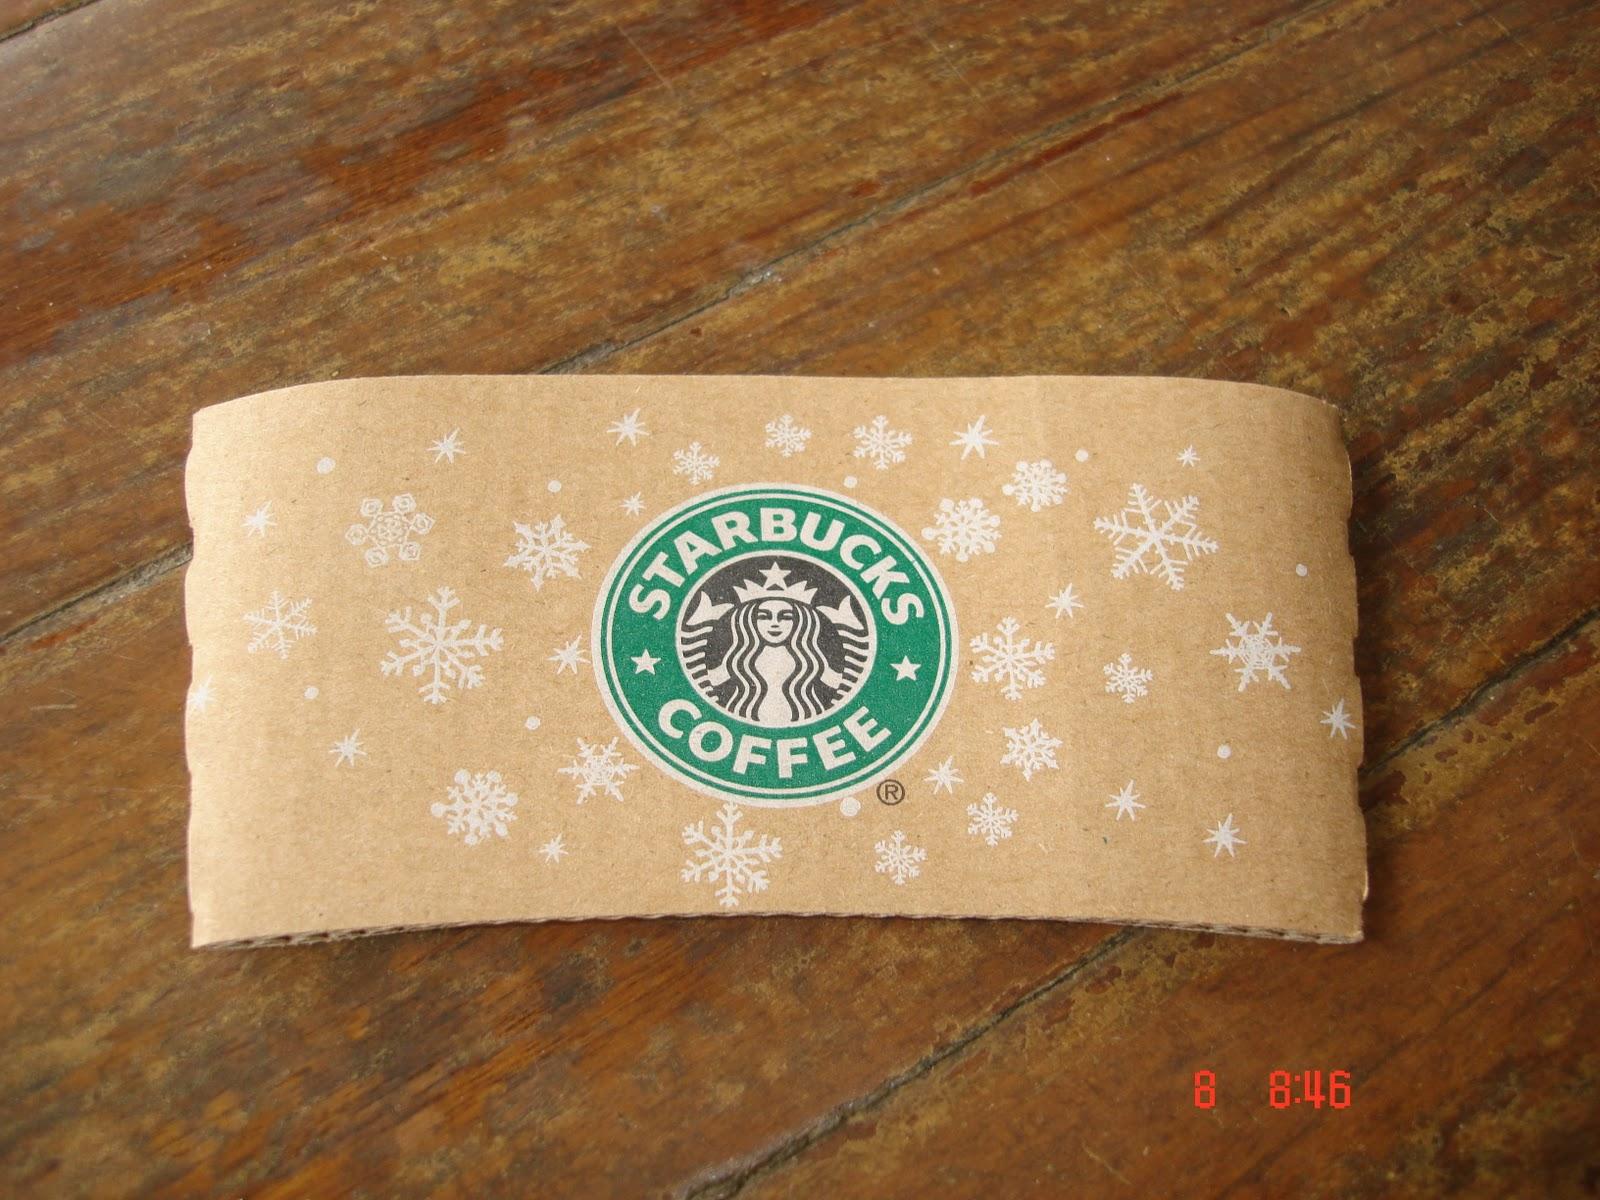 2010 Starbucks Christmas Paper Cup Sleeve